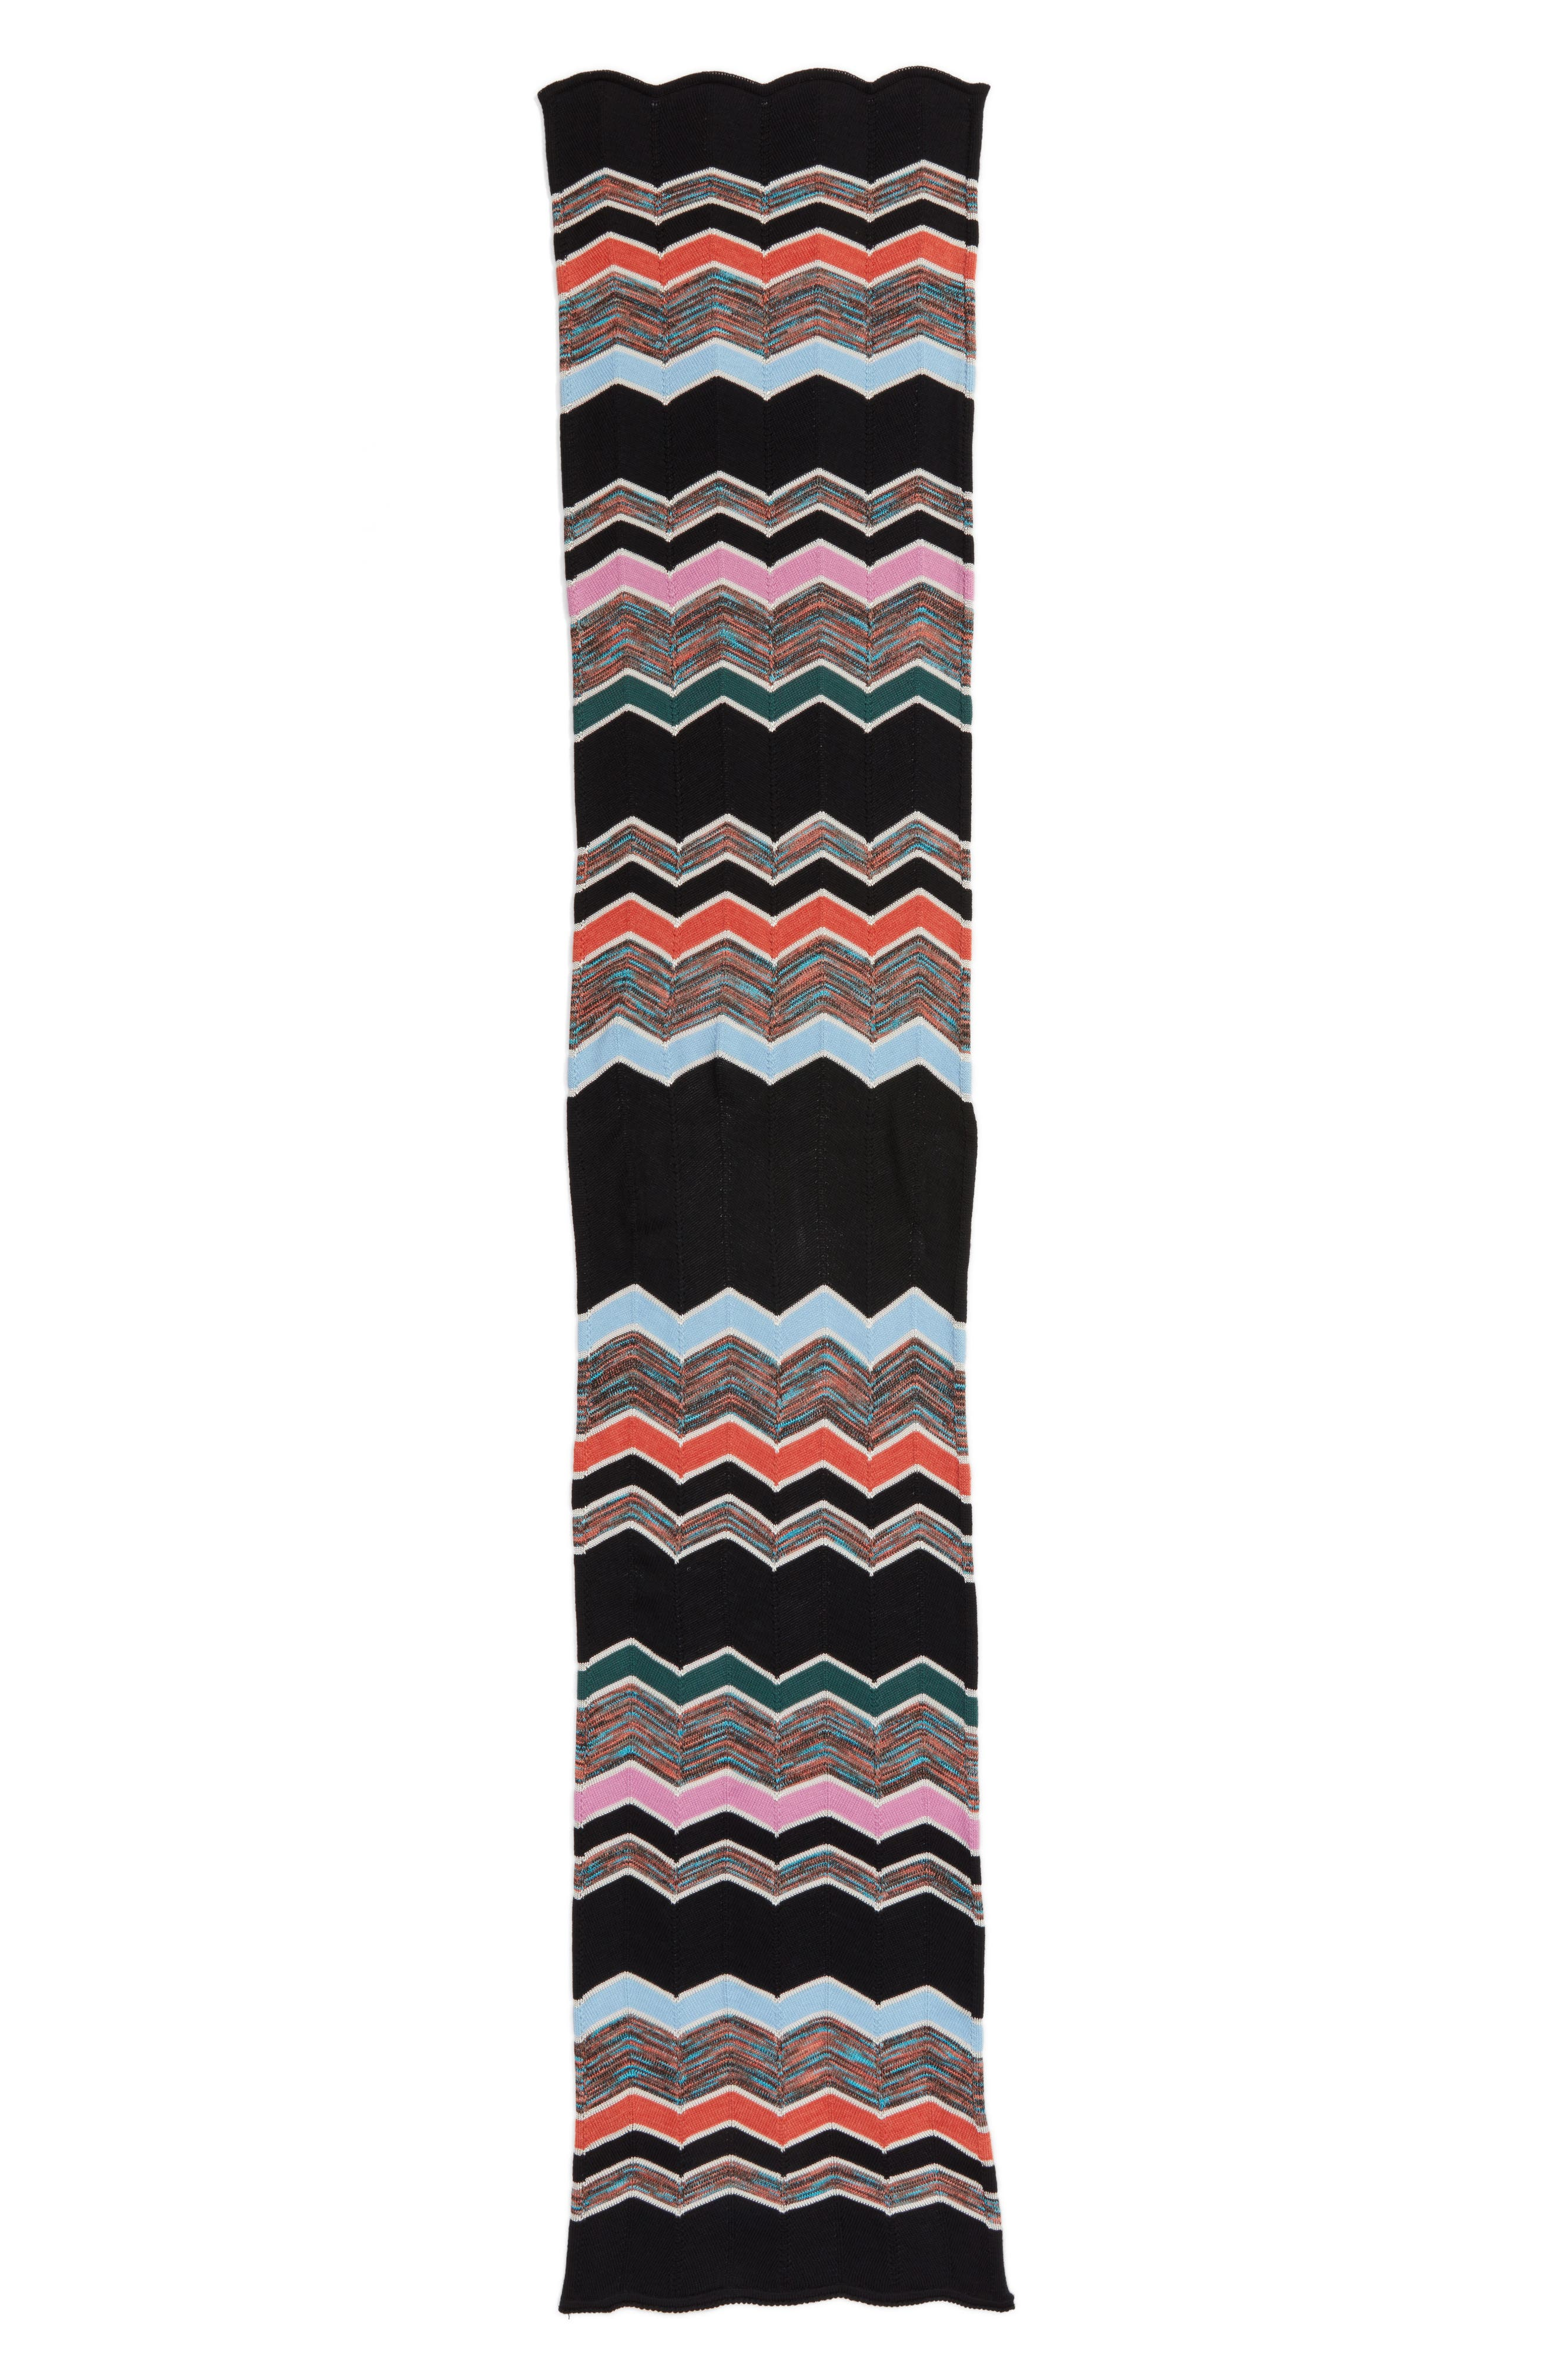 Zigzag Scarf,                             Main thumbnail 1, color,                             PINK/ BLACK